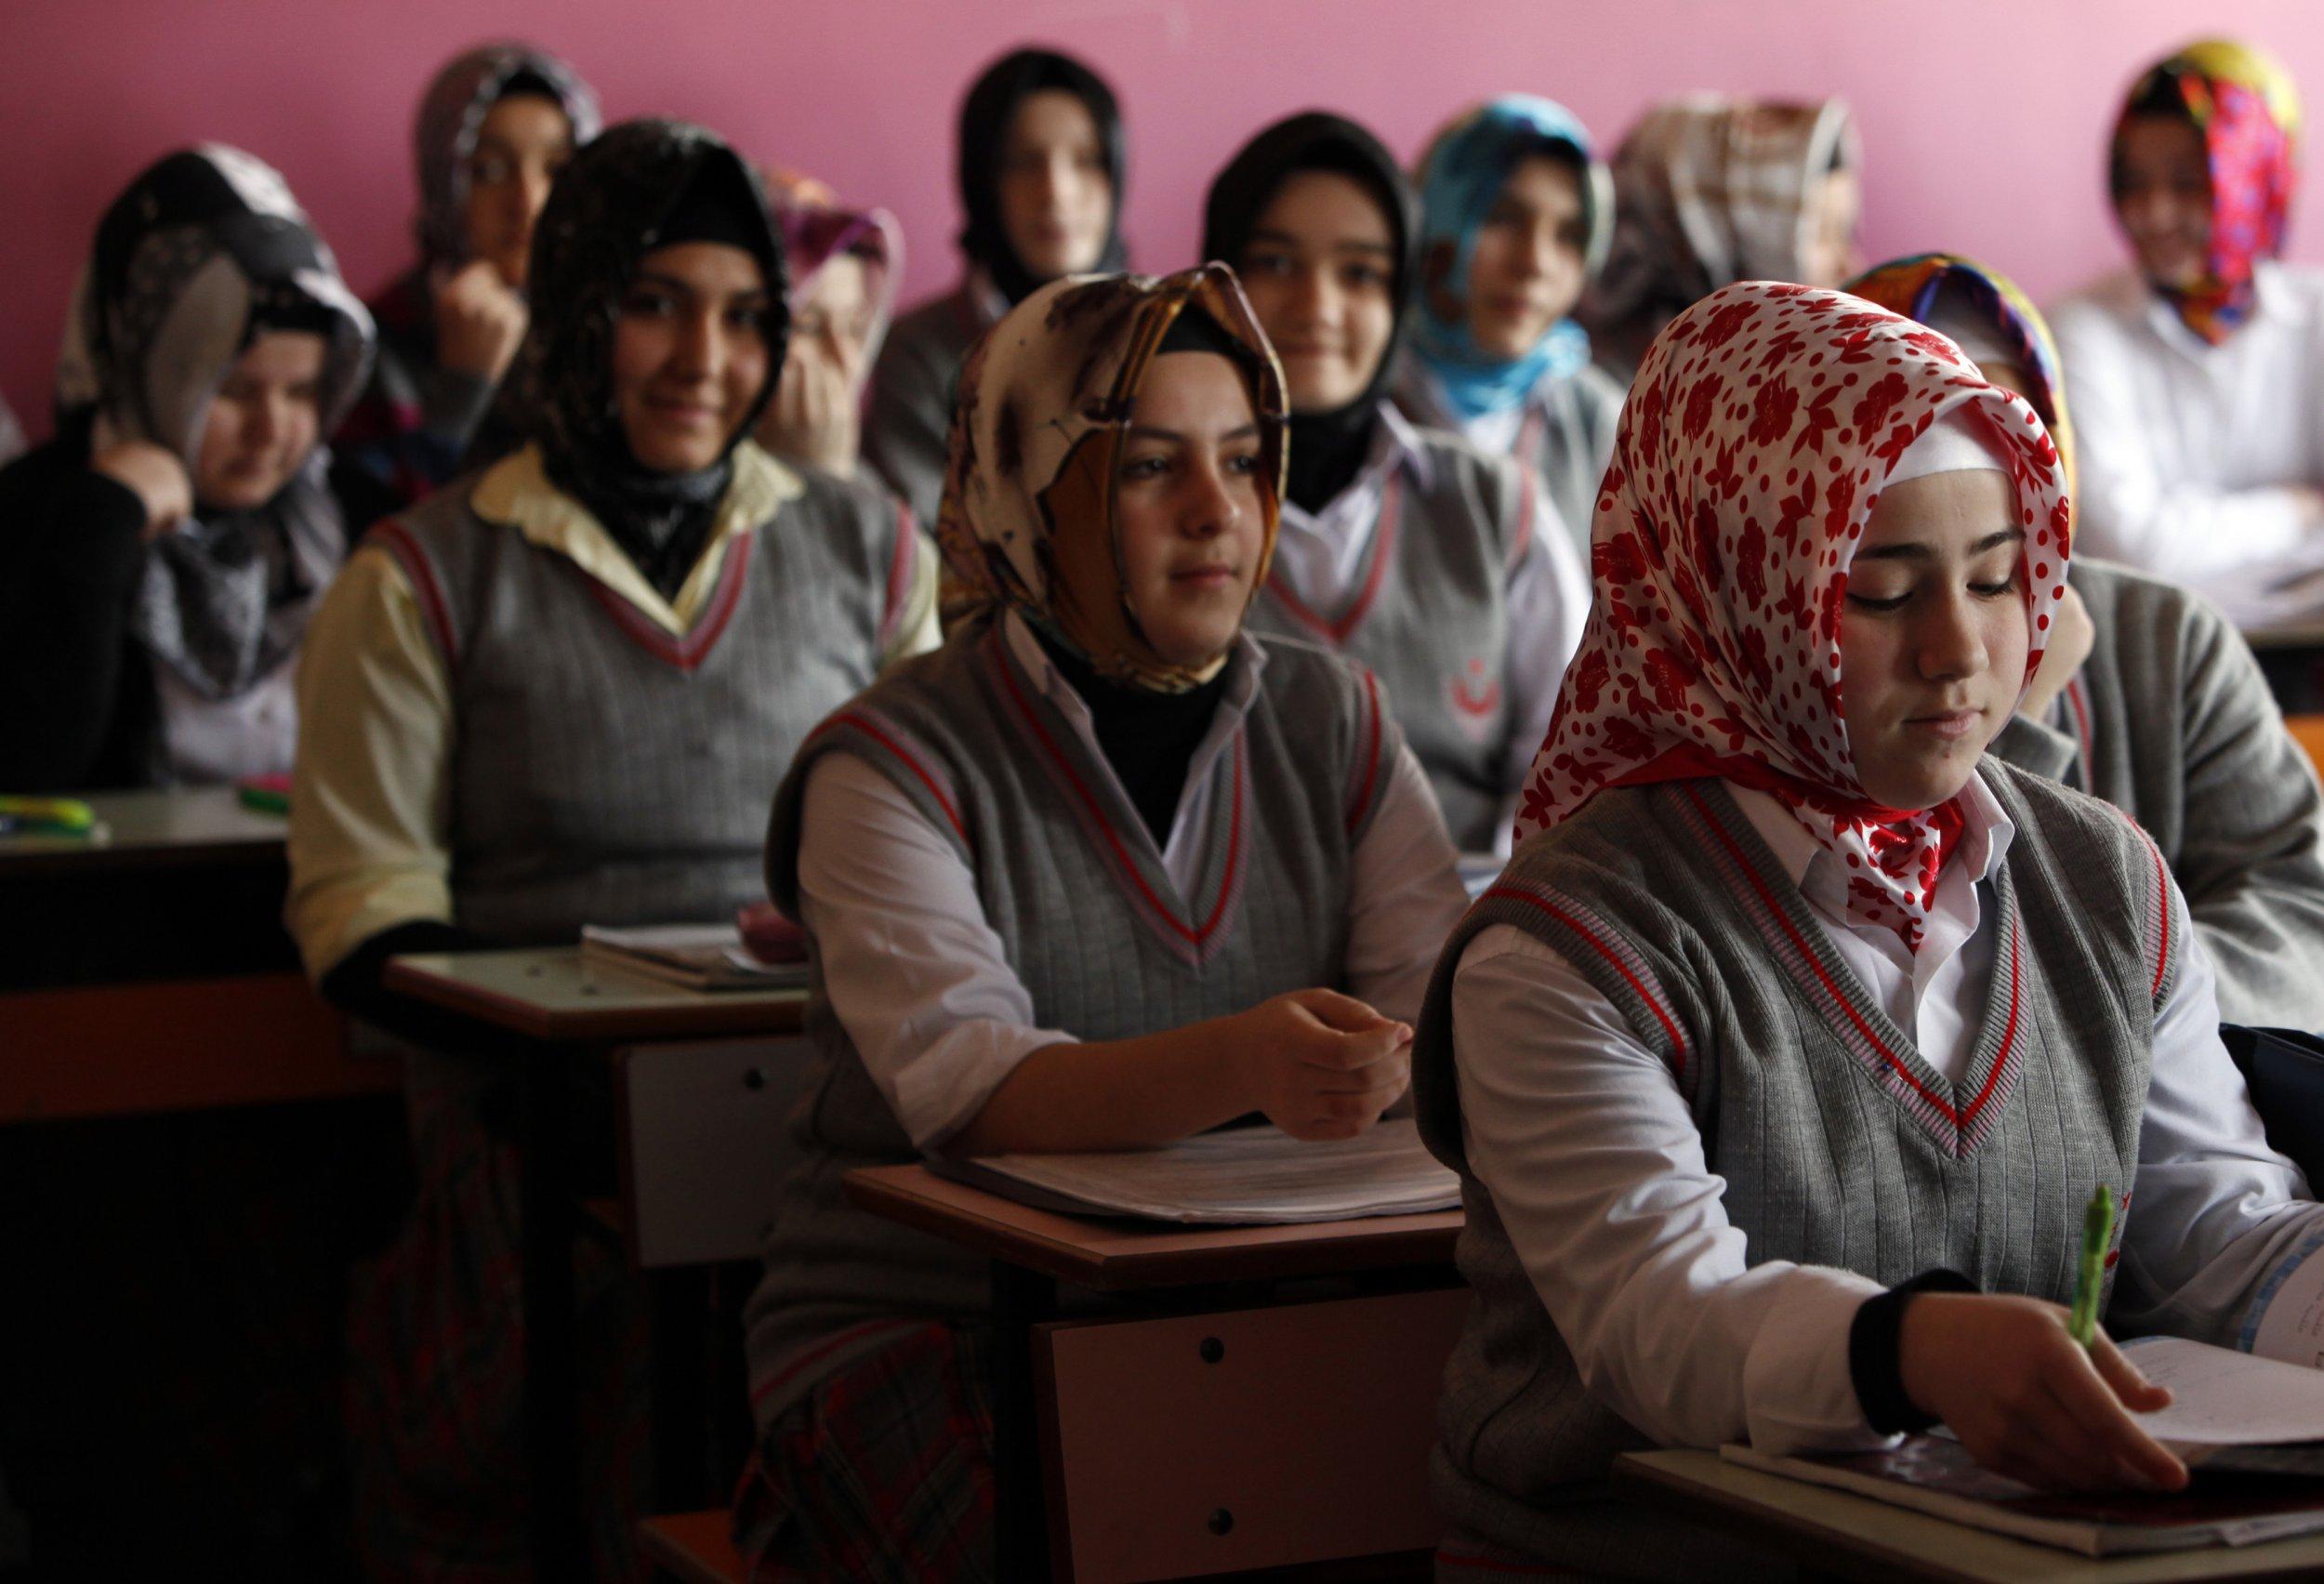 Turkey schoolgirls